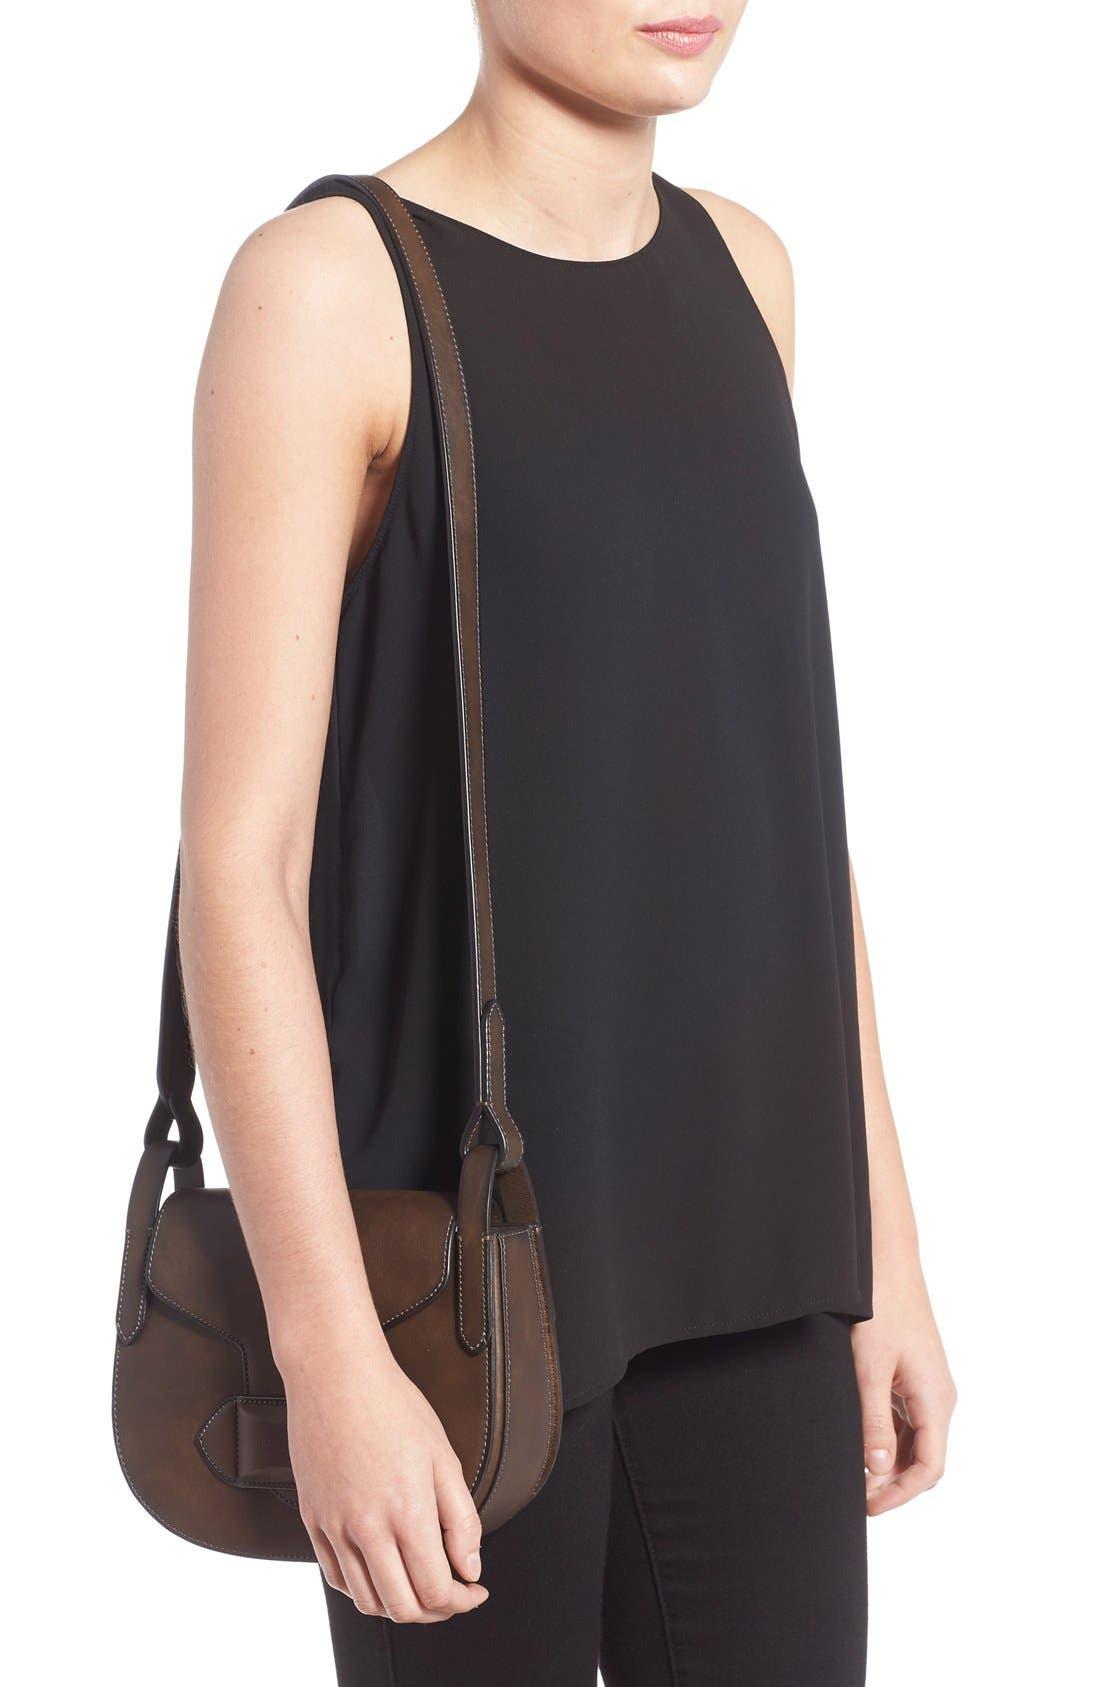 Alternate Image 2  - Michael Kors 'Daria' Leather Saddle Bag